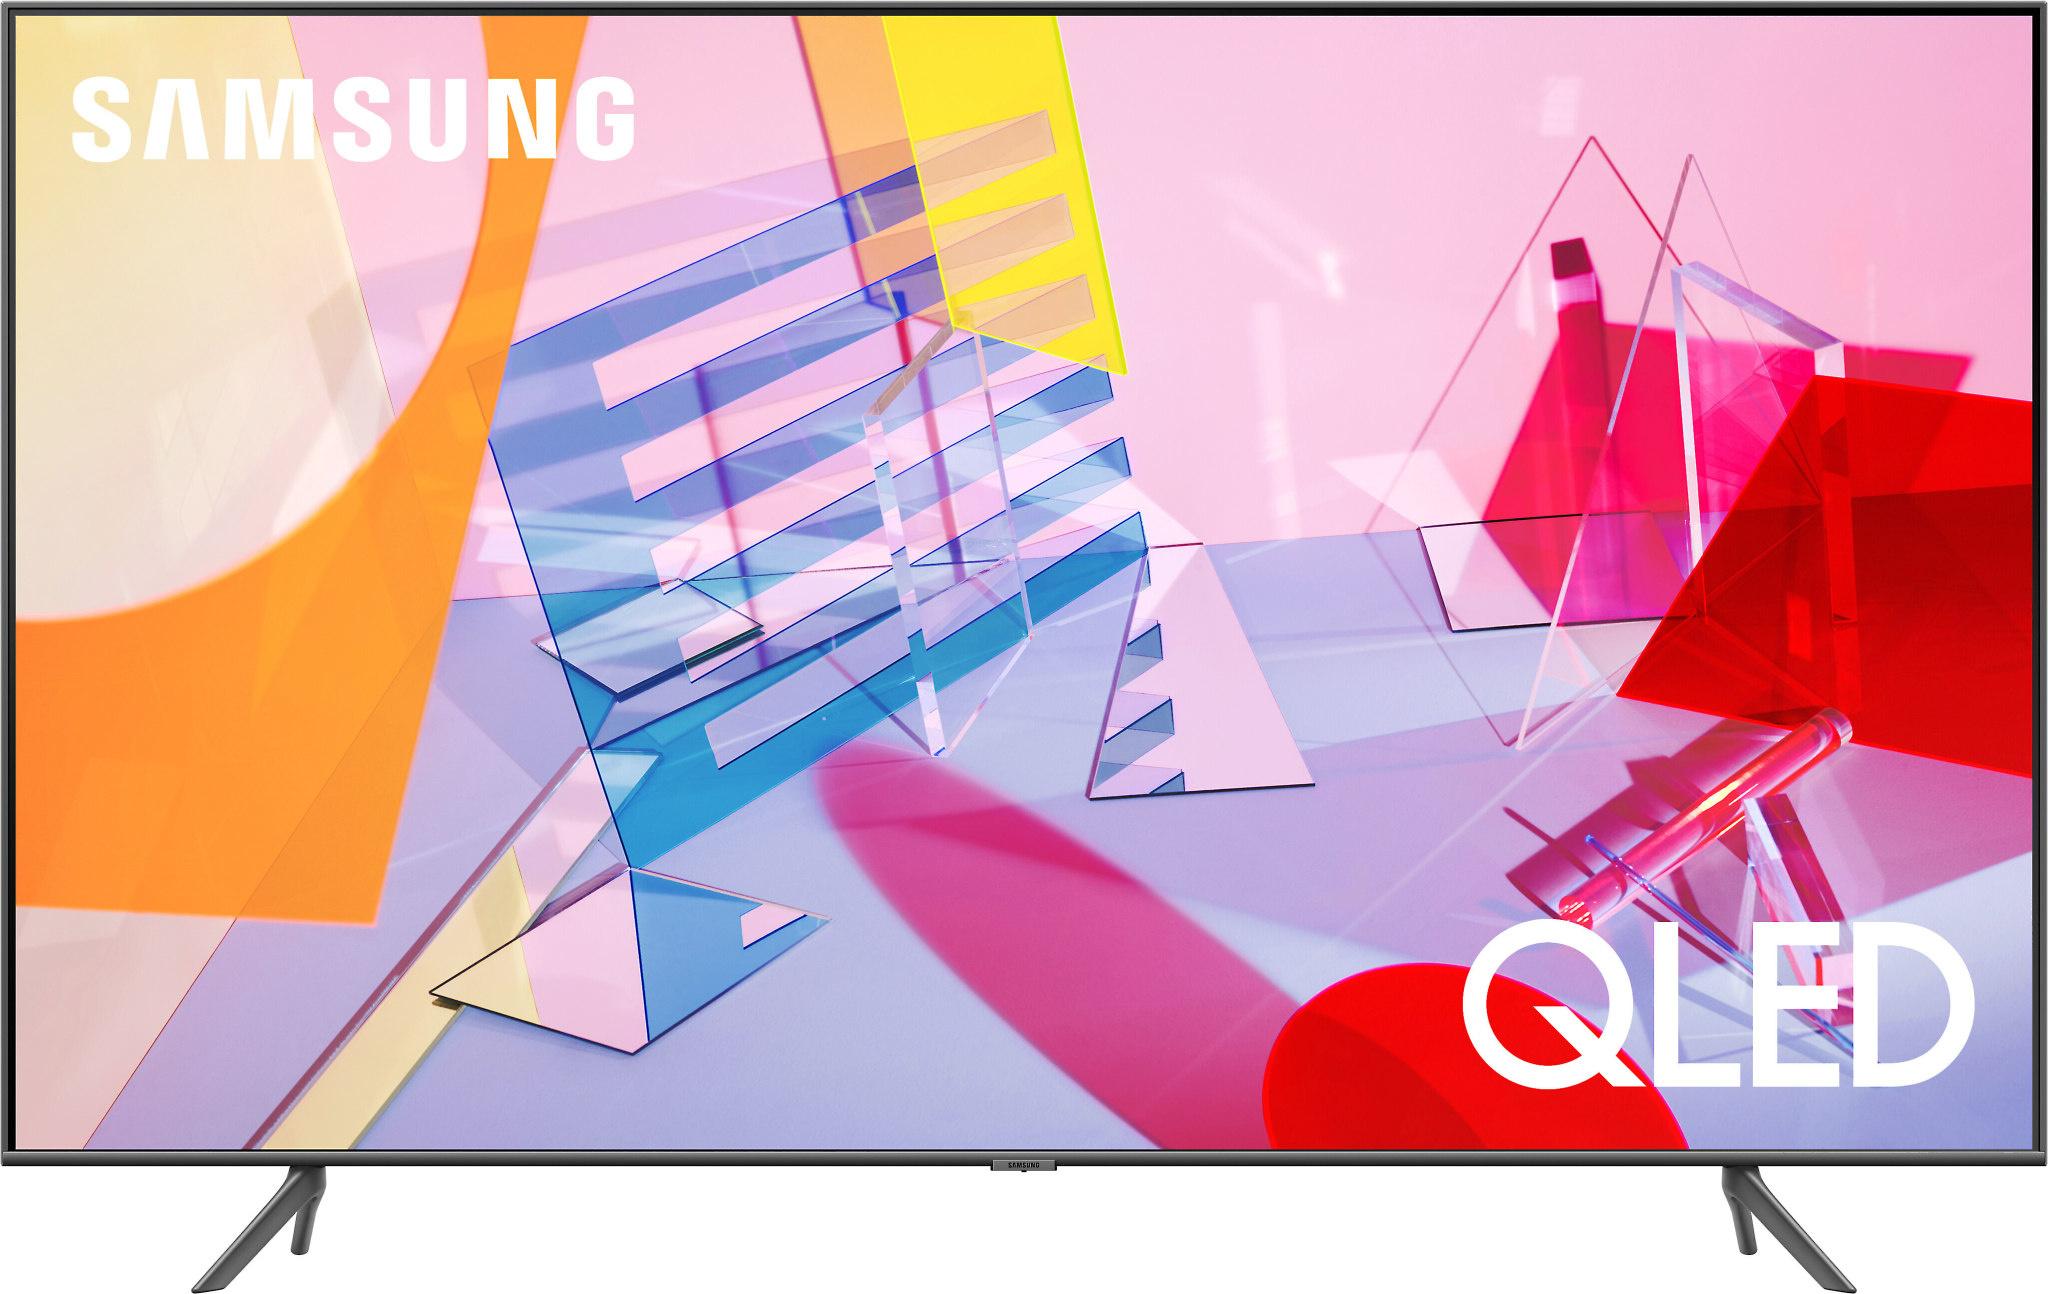 Samsung Samsung QN50Q60T QLED 4K HDR Smart TV